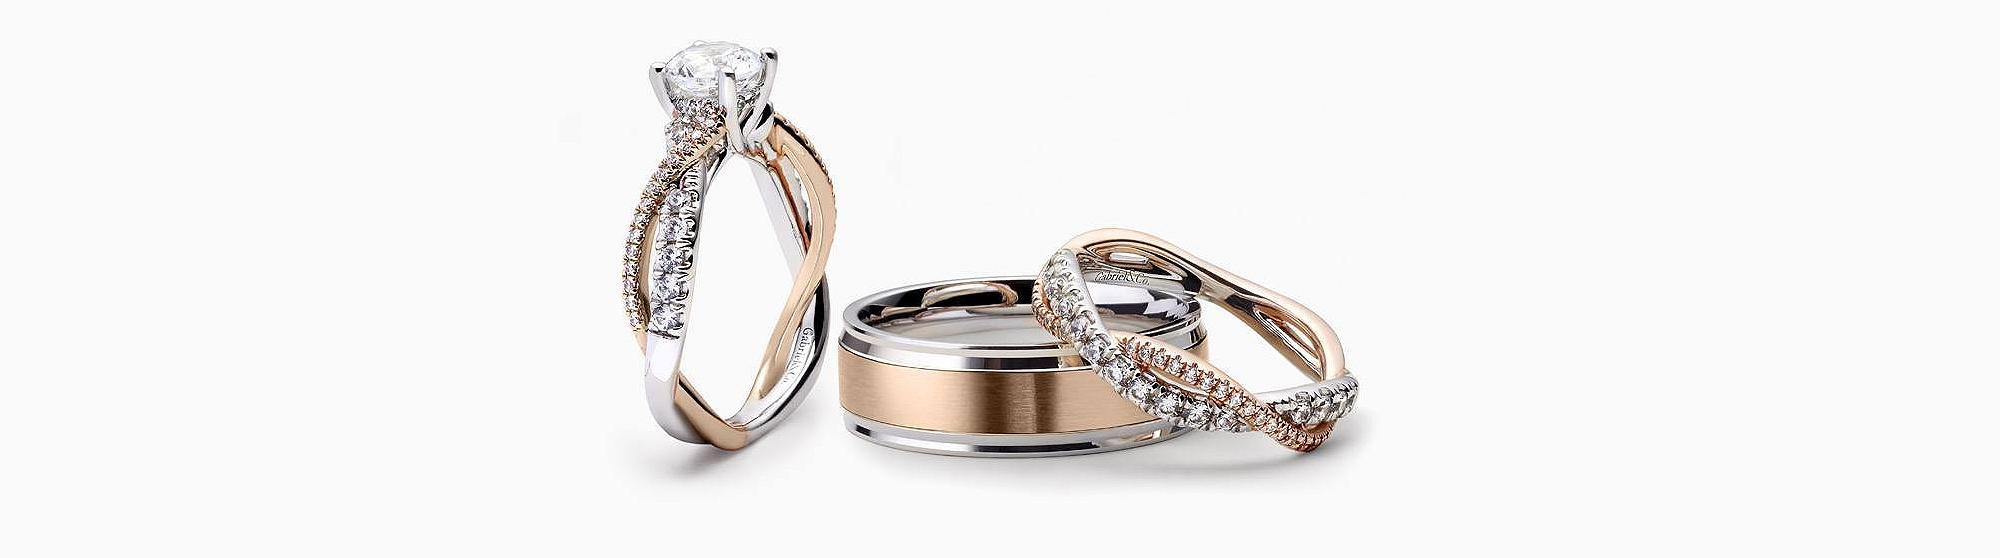 Gabriel&Co Verragio Diamond Engagement Gold Ring Earring Bracelet Necklaces Jewellery Surrey Canada